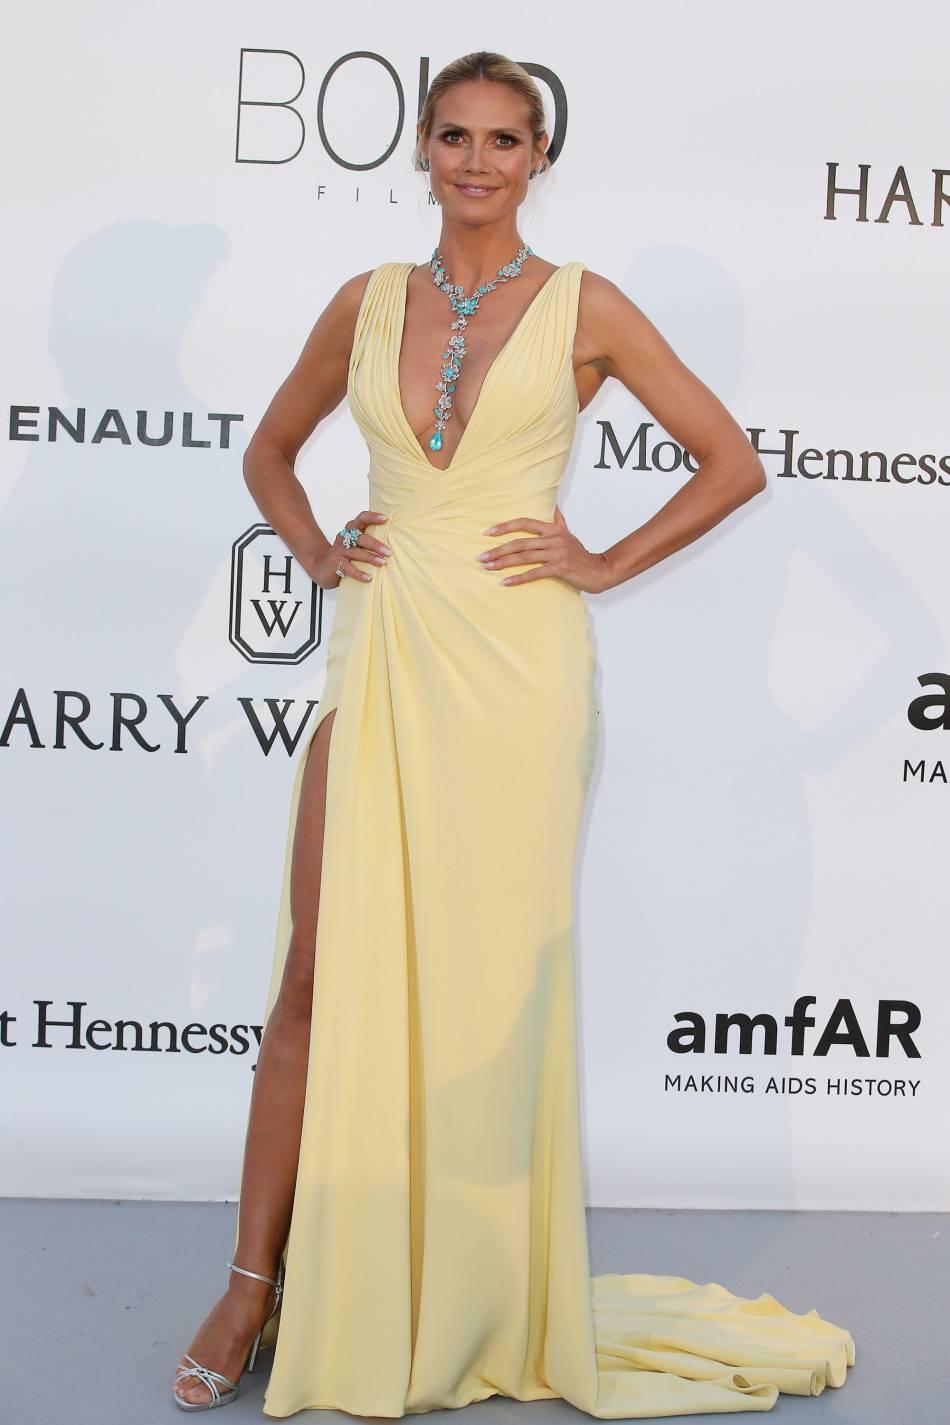 Heidi Klum en Atelier Versace, sandales Giuseppe Zanotti Design et bijoux Lorraine Schwartzau gala de l'amfAR Cinema against AIDS le 19 mai 2016 à Cannes.